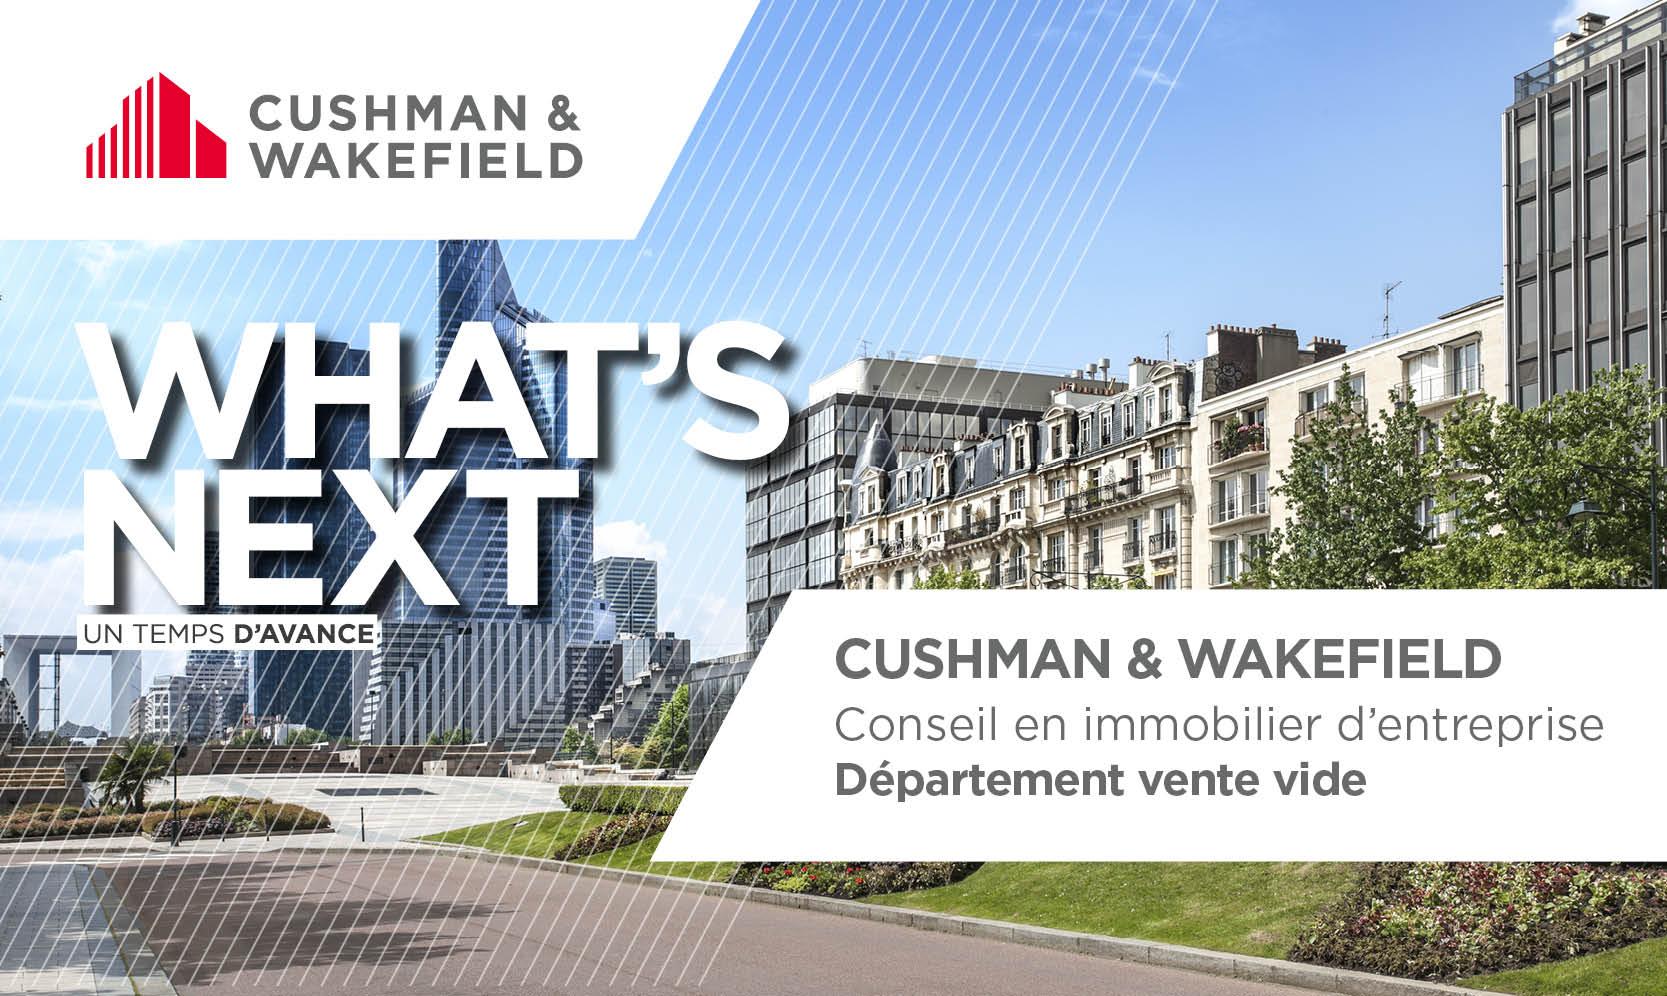 CUSHMAN & WAKEFIELD VENTES - Image